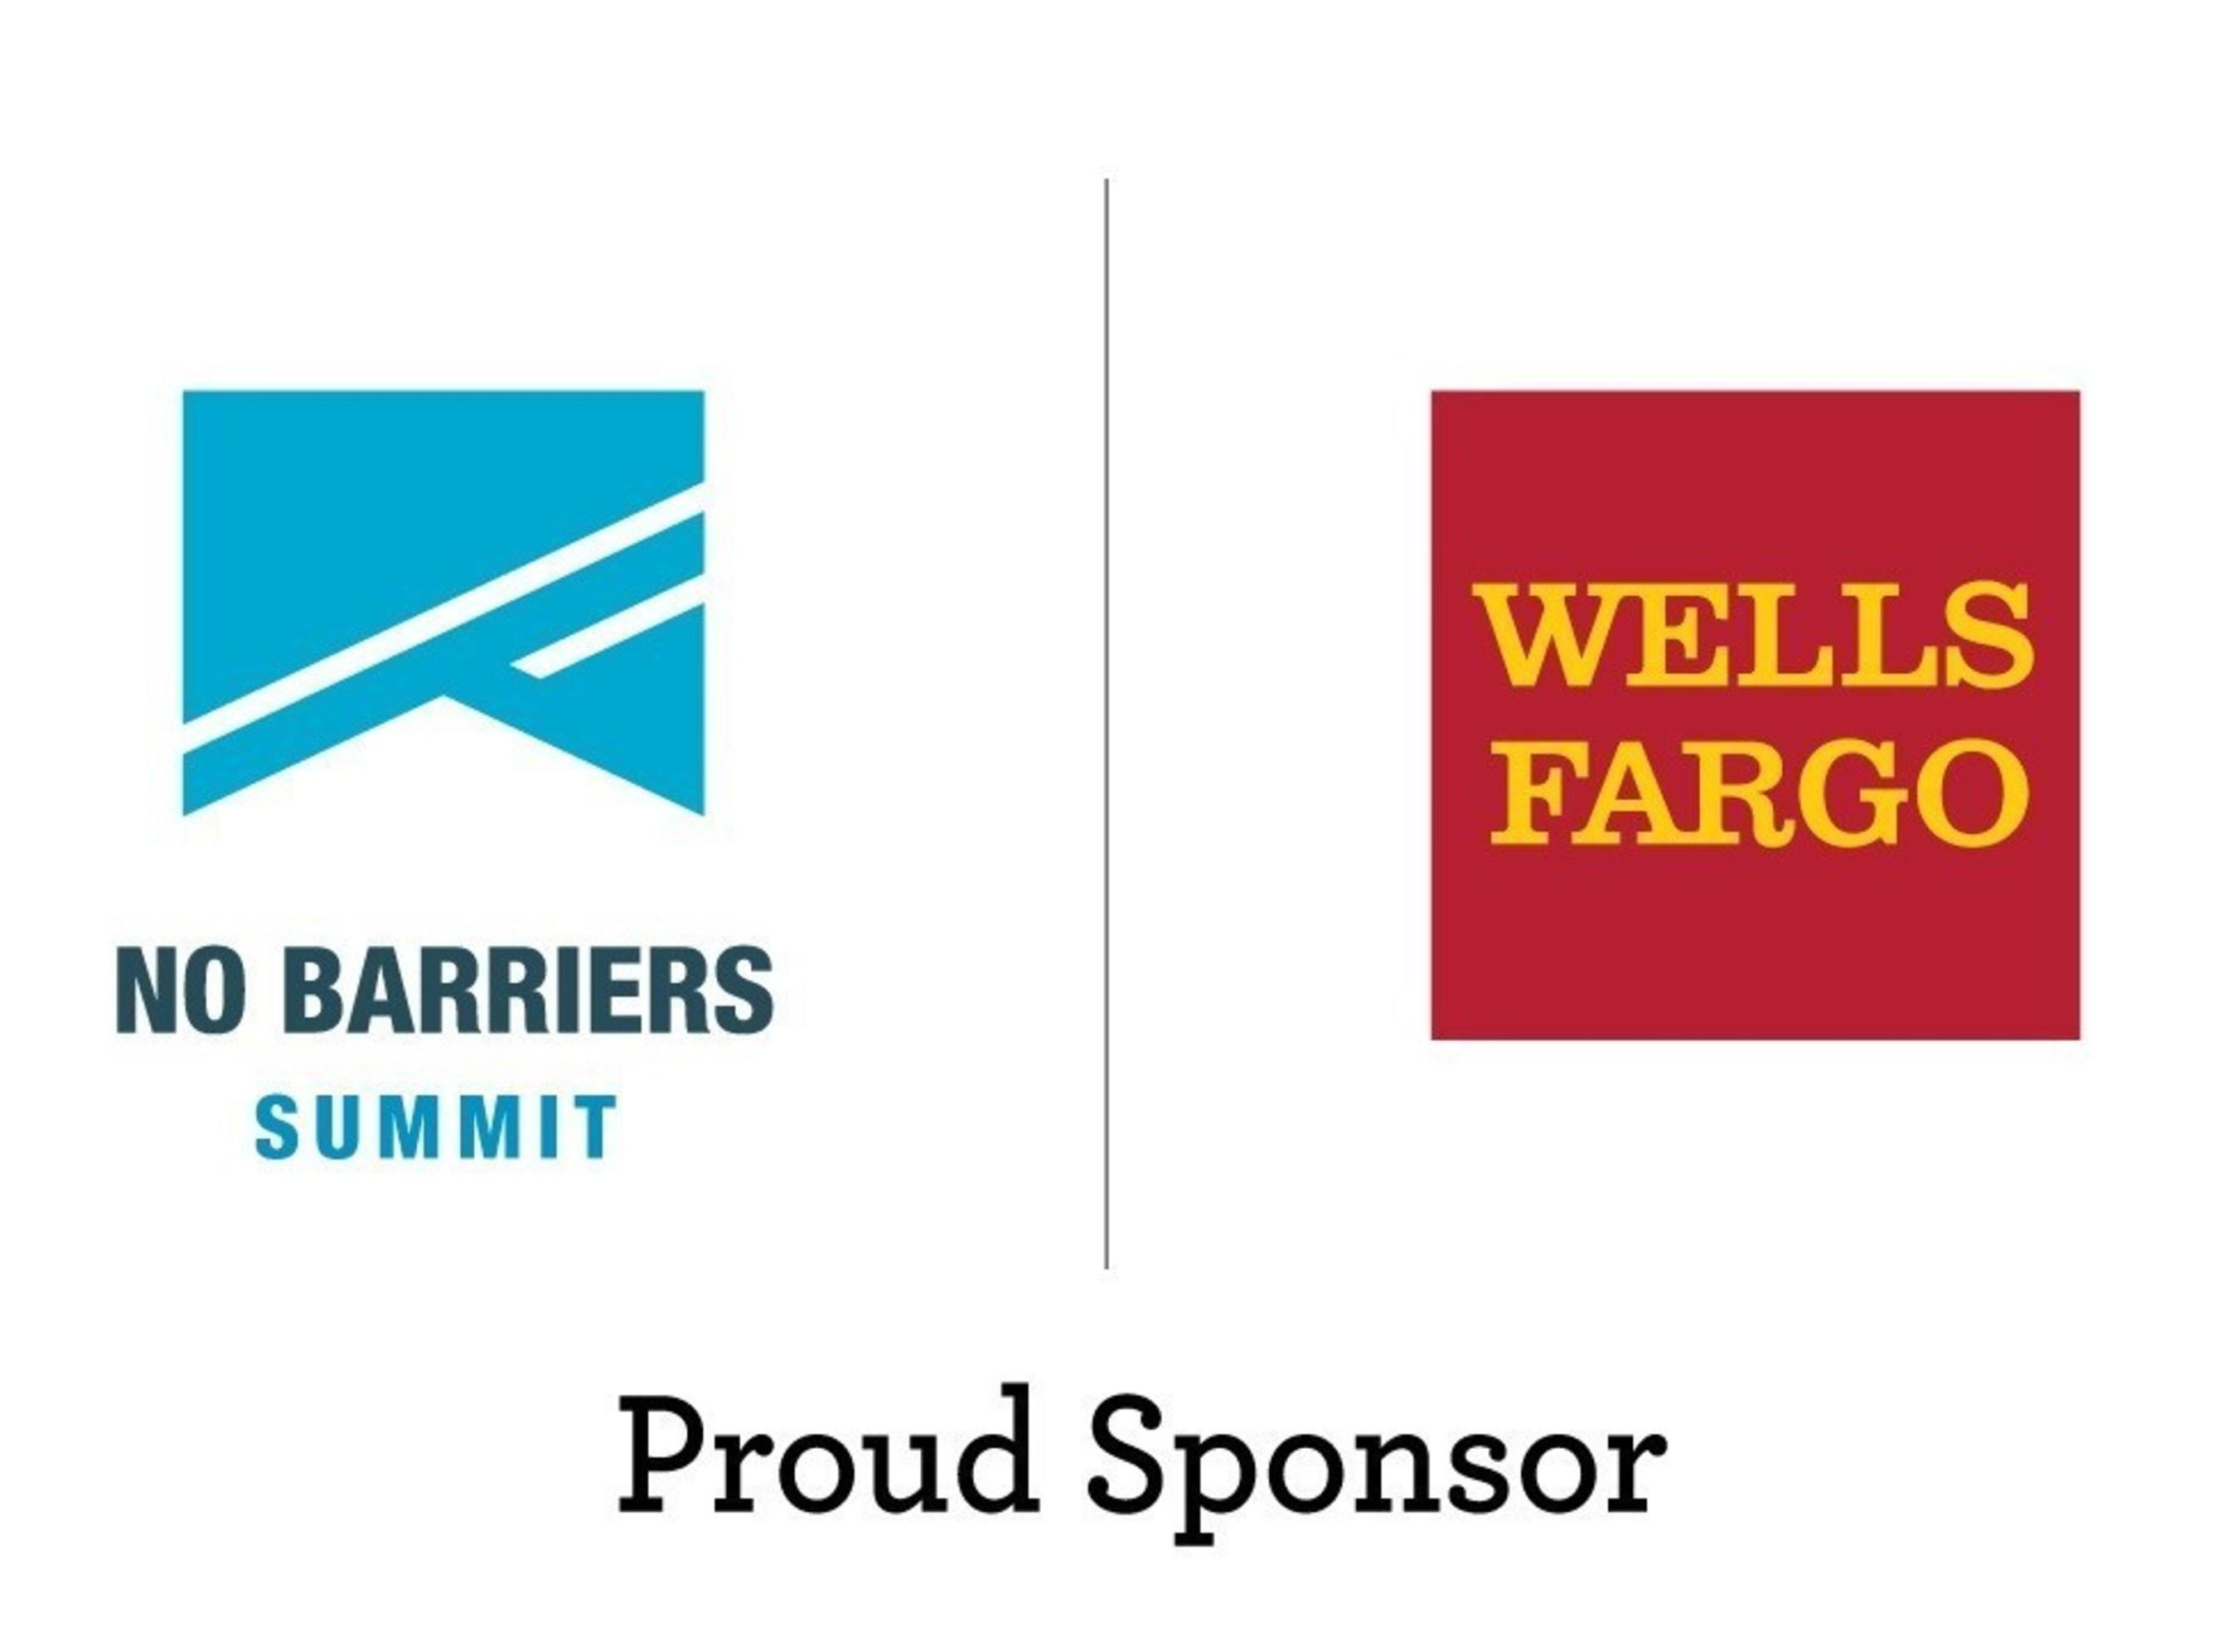 Wells Fargo, No Barriers Summit Launch 25th ADA Anniversary Videos